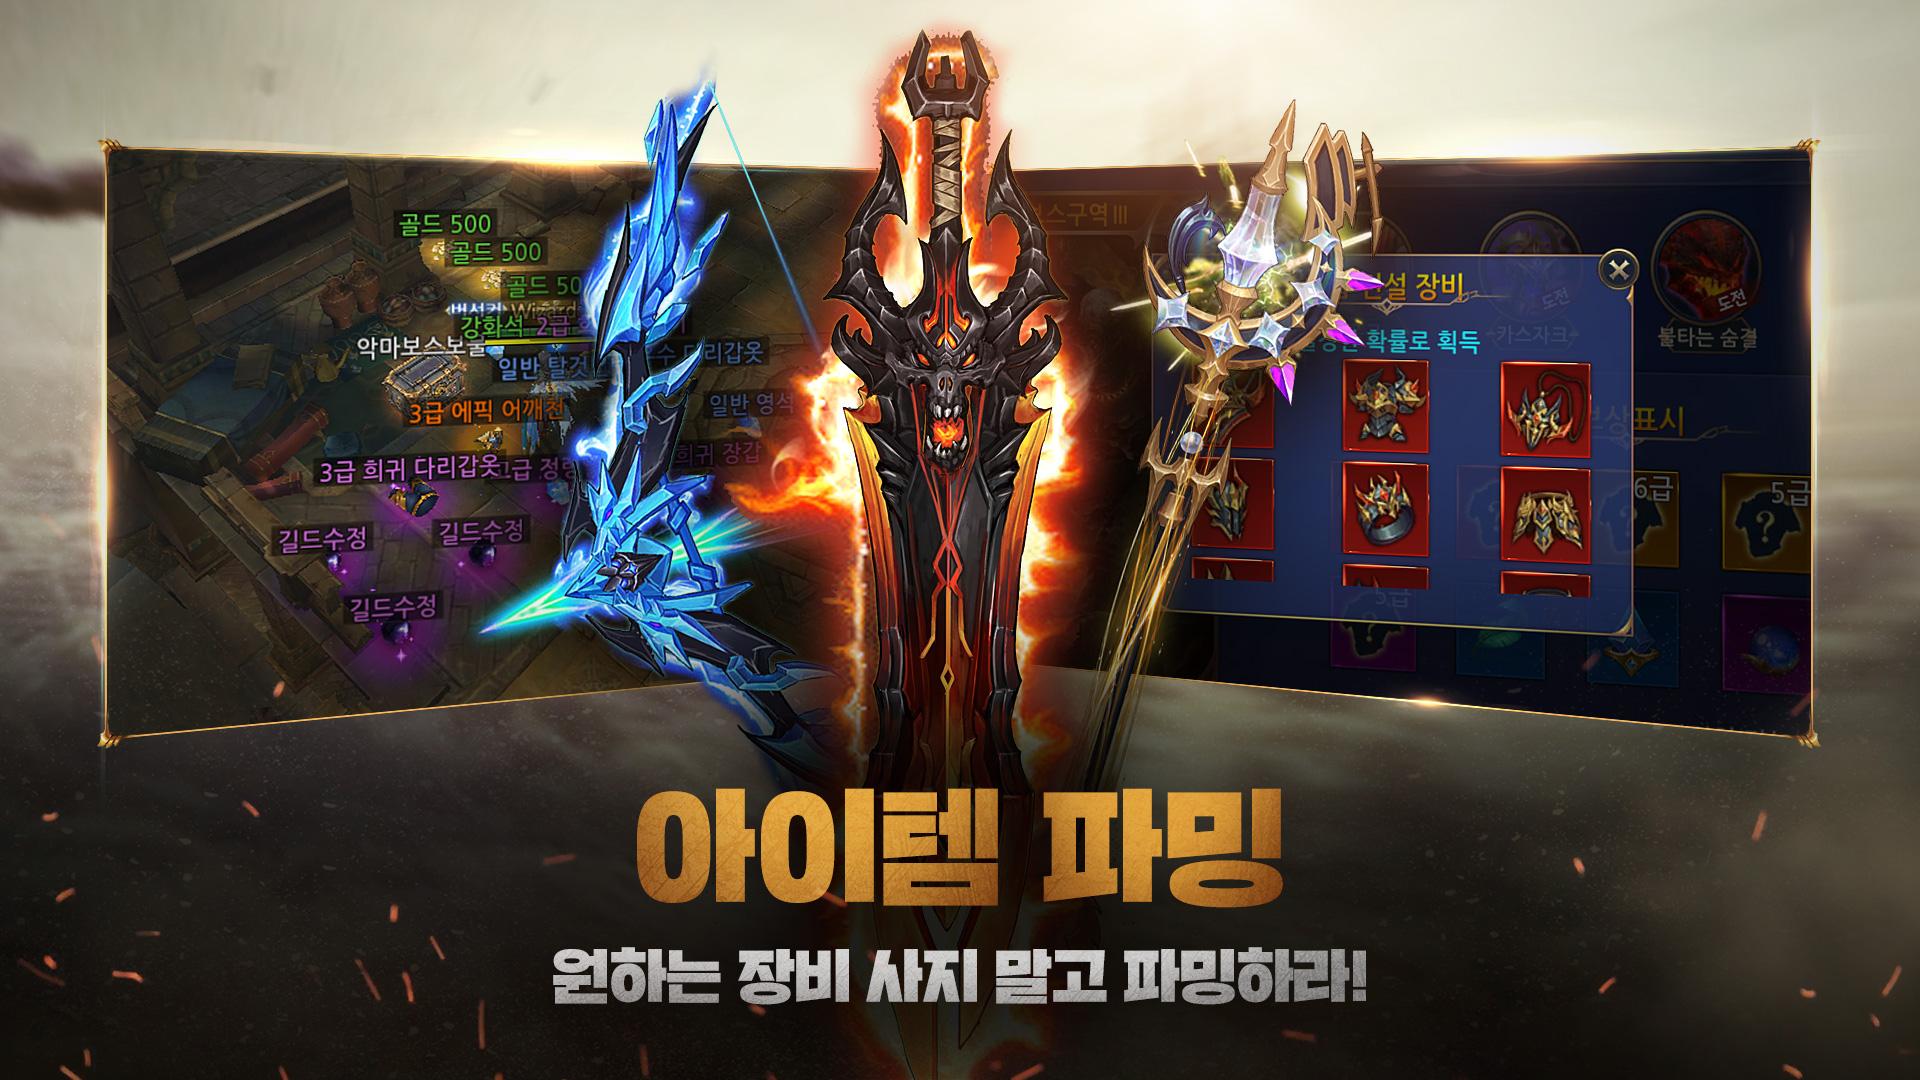 Eternal Lord 1542019 4